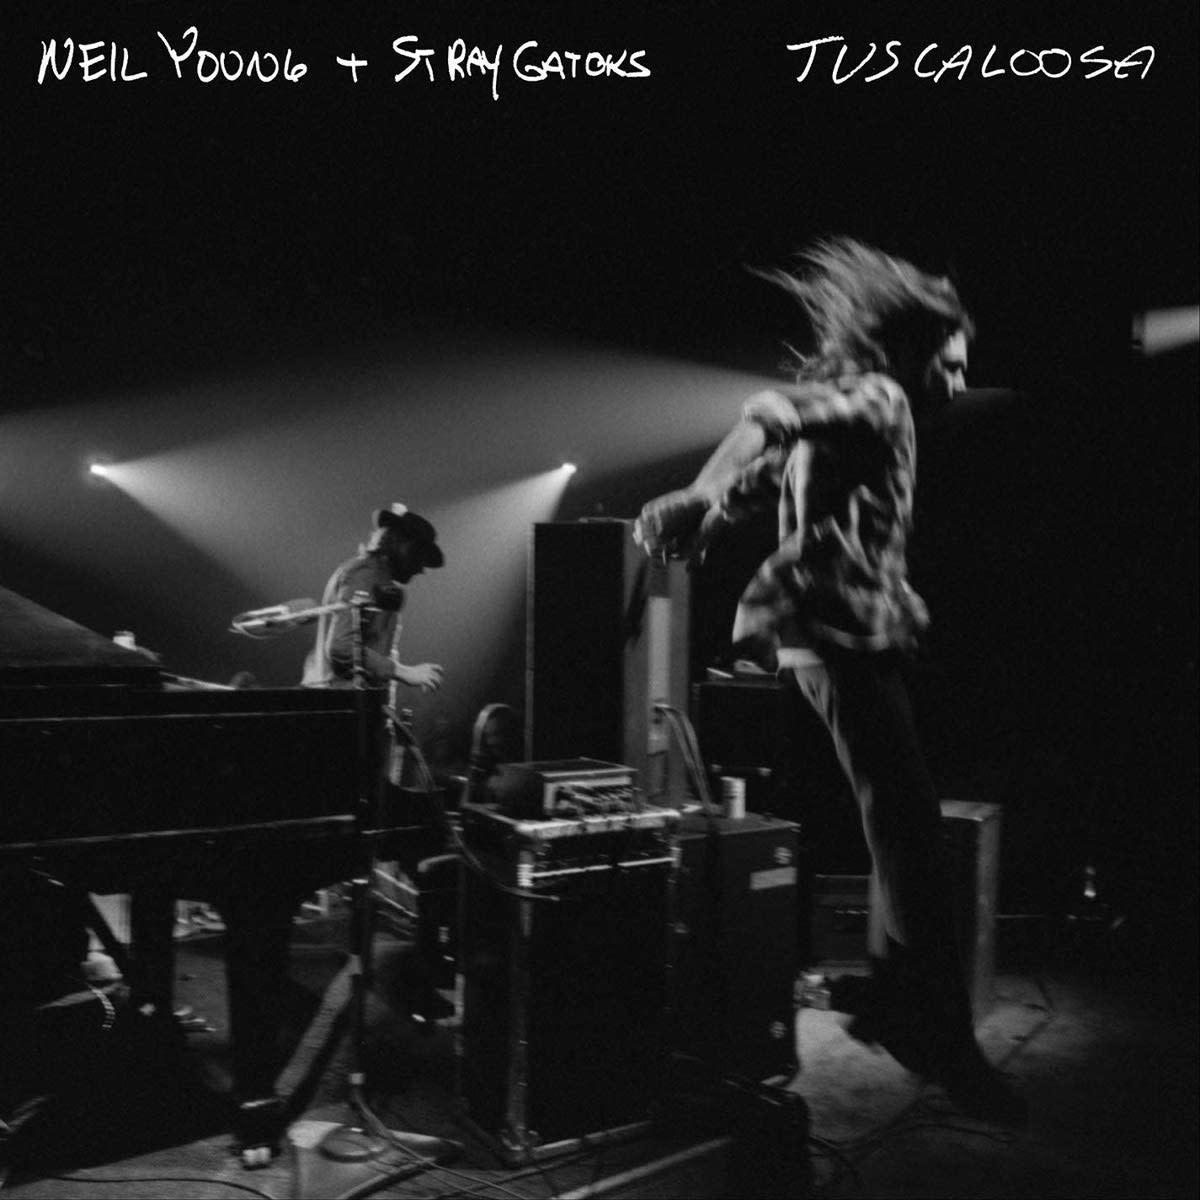 Warner Neil Young & Stray Gators - Tuscaloosa (Live)